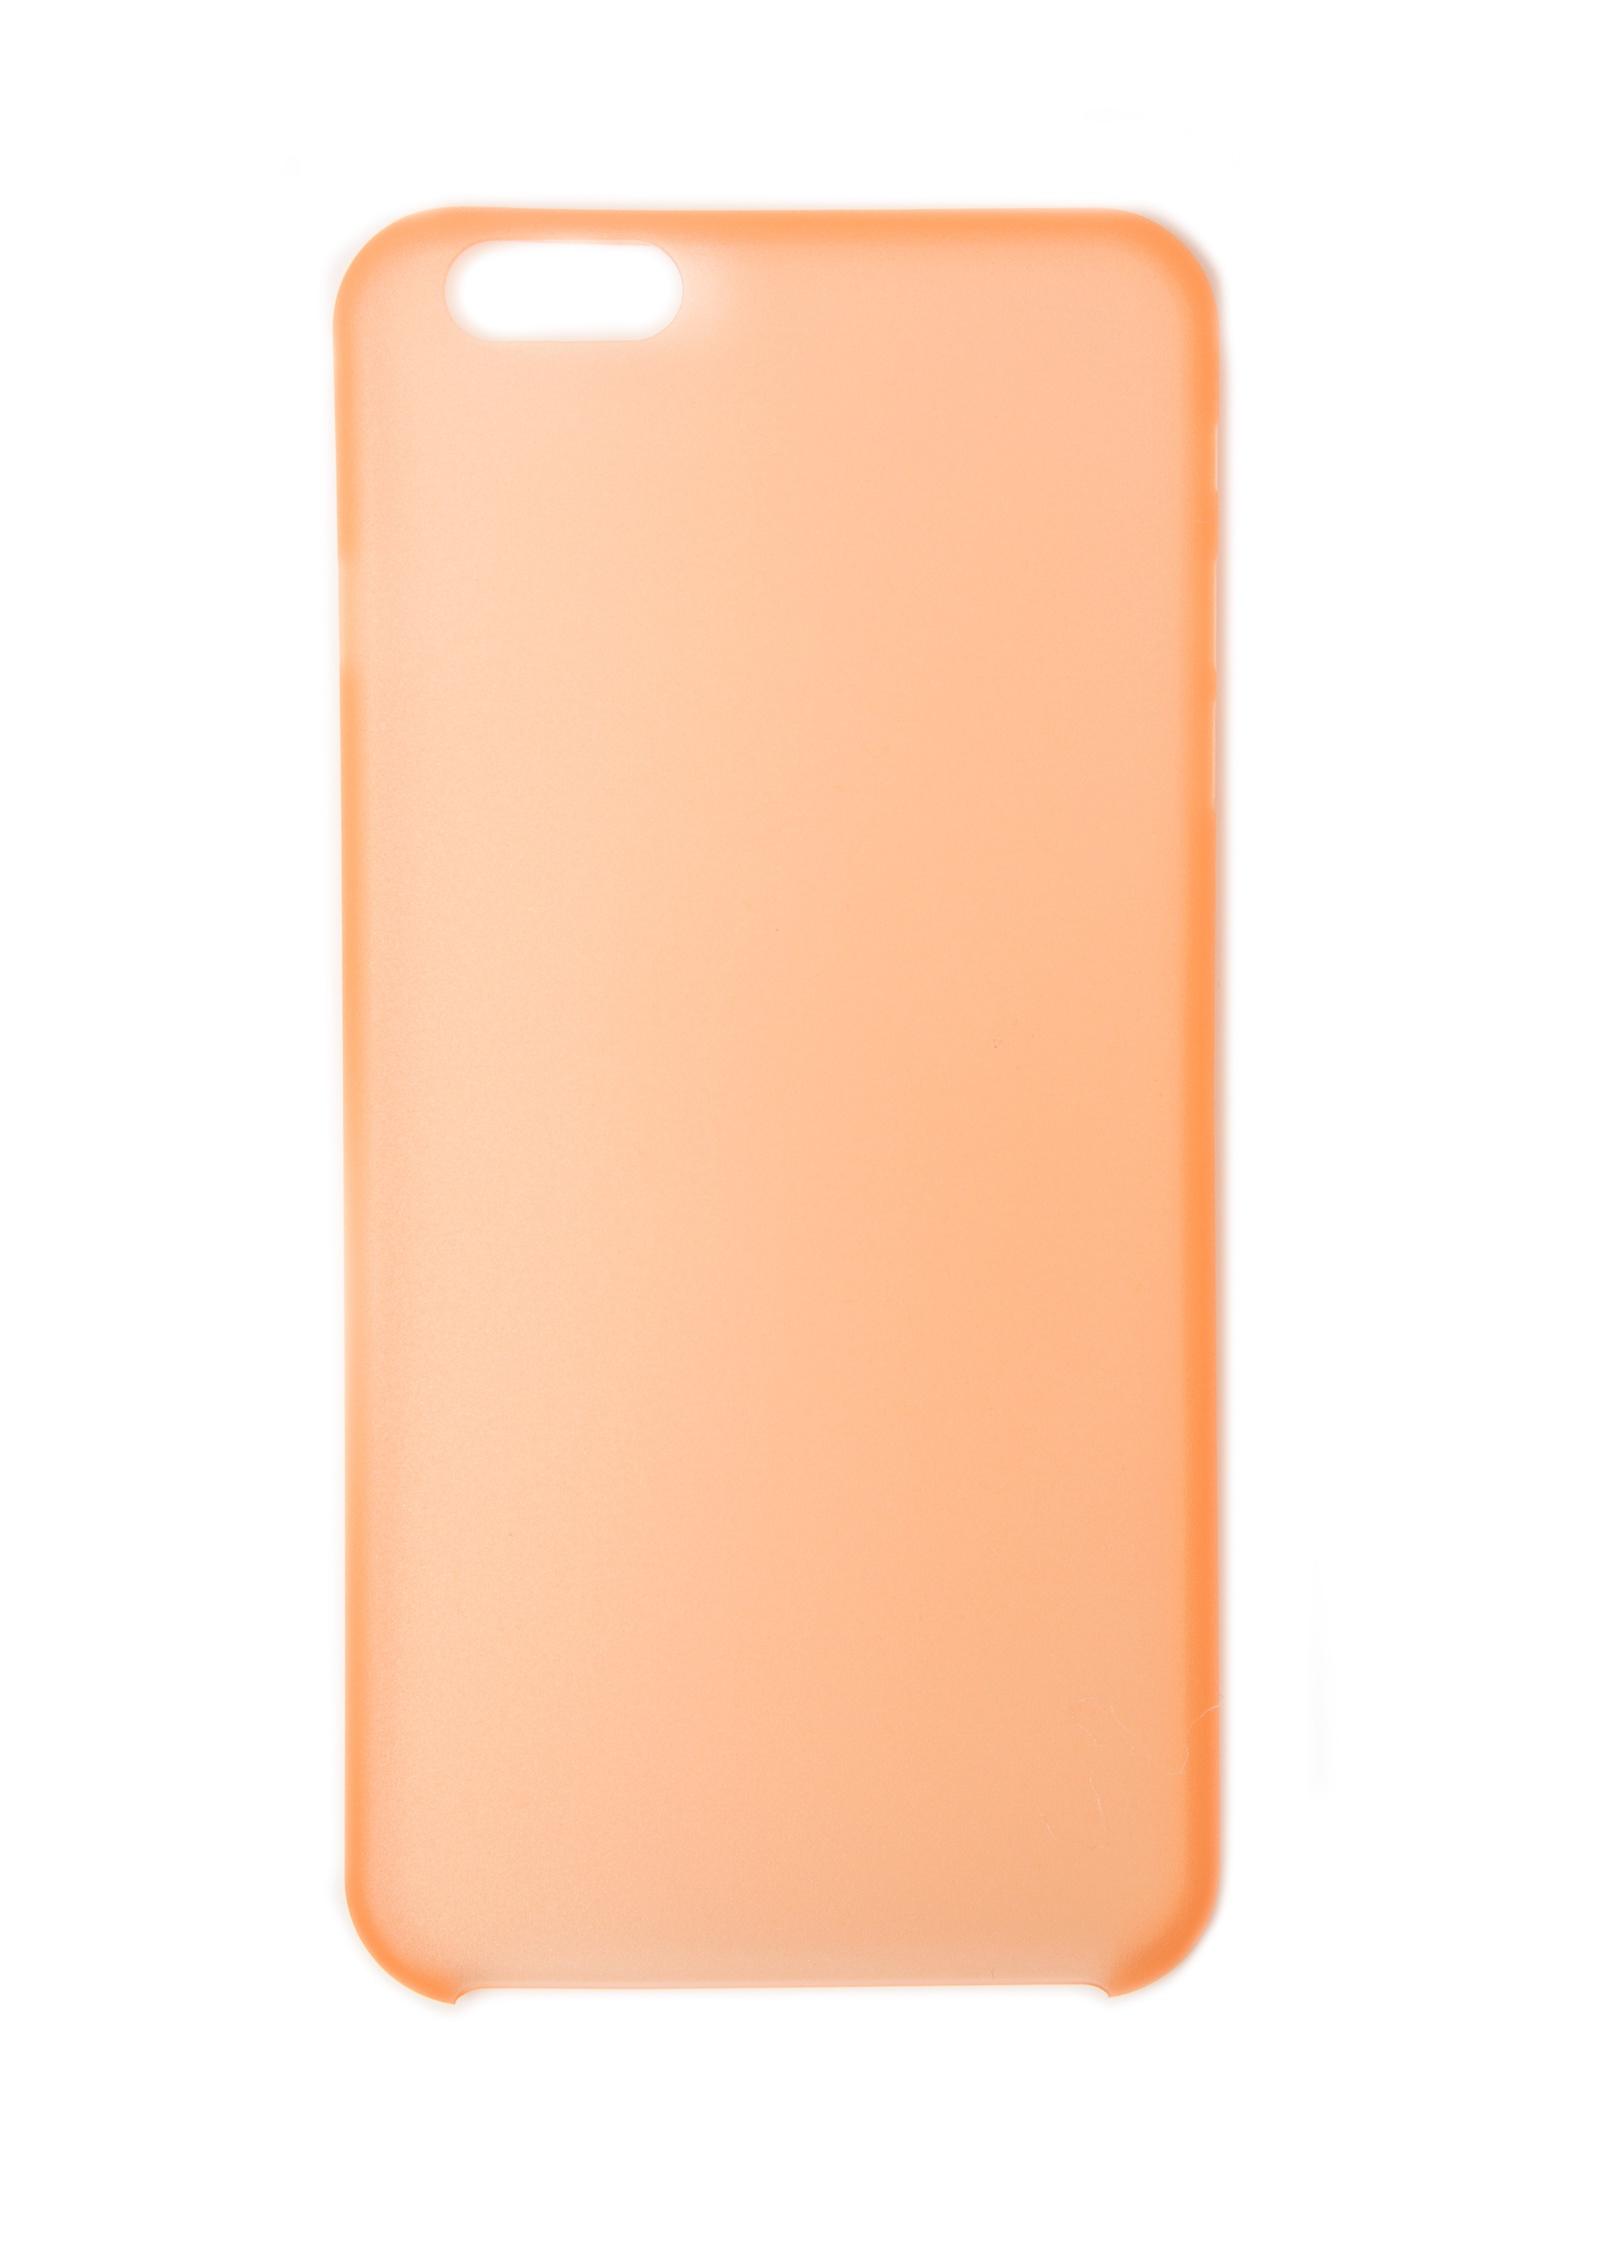 Чехол для сотового телефона Mitya Veselkov CASE, IP6.МITYA-238PVC все цены